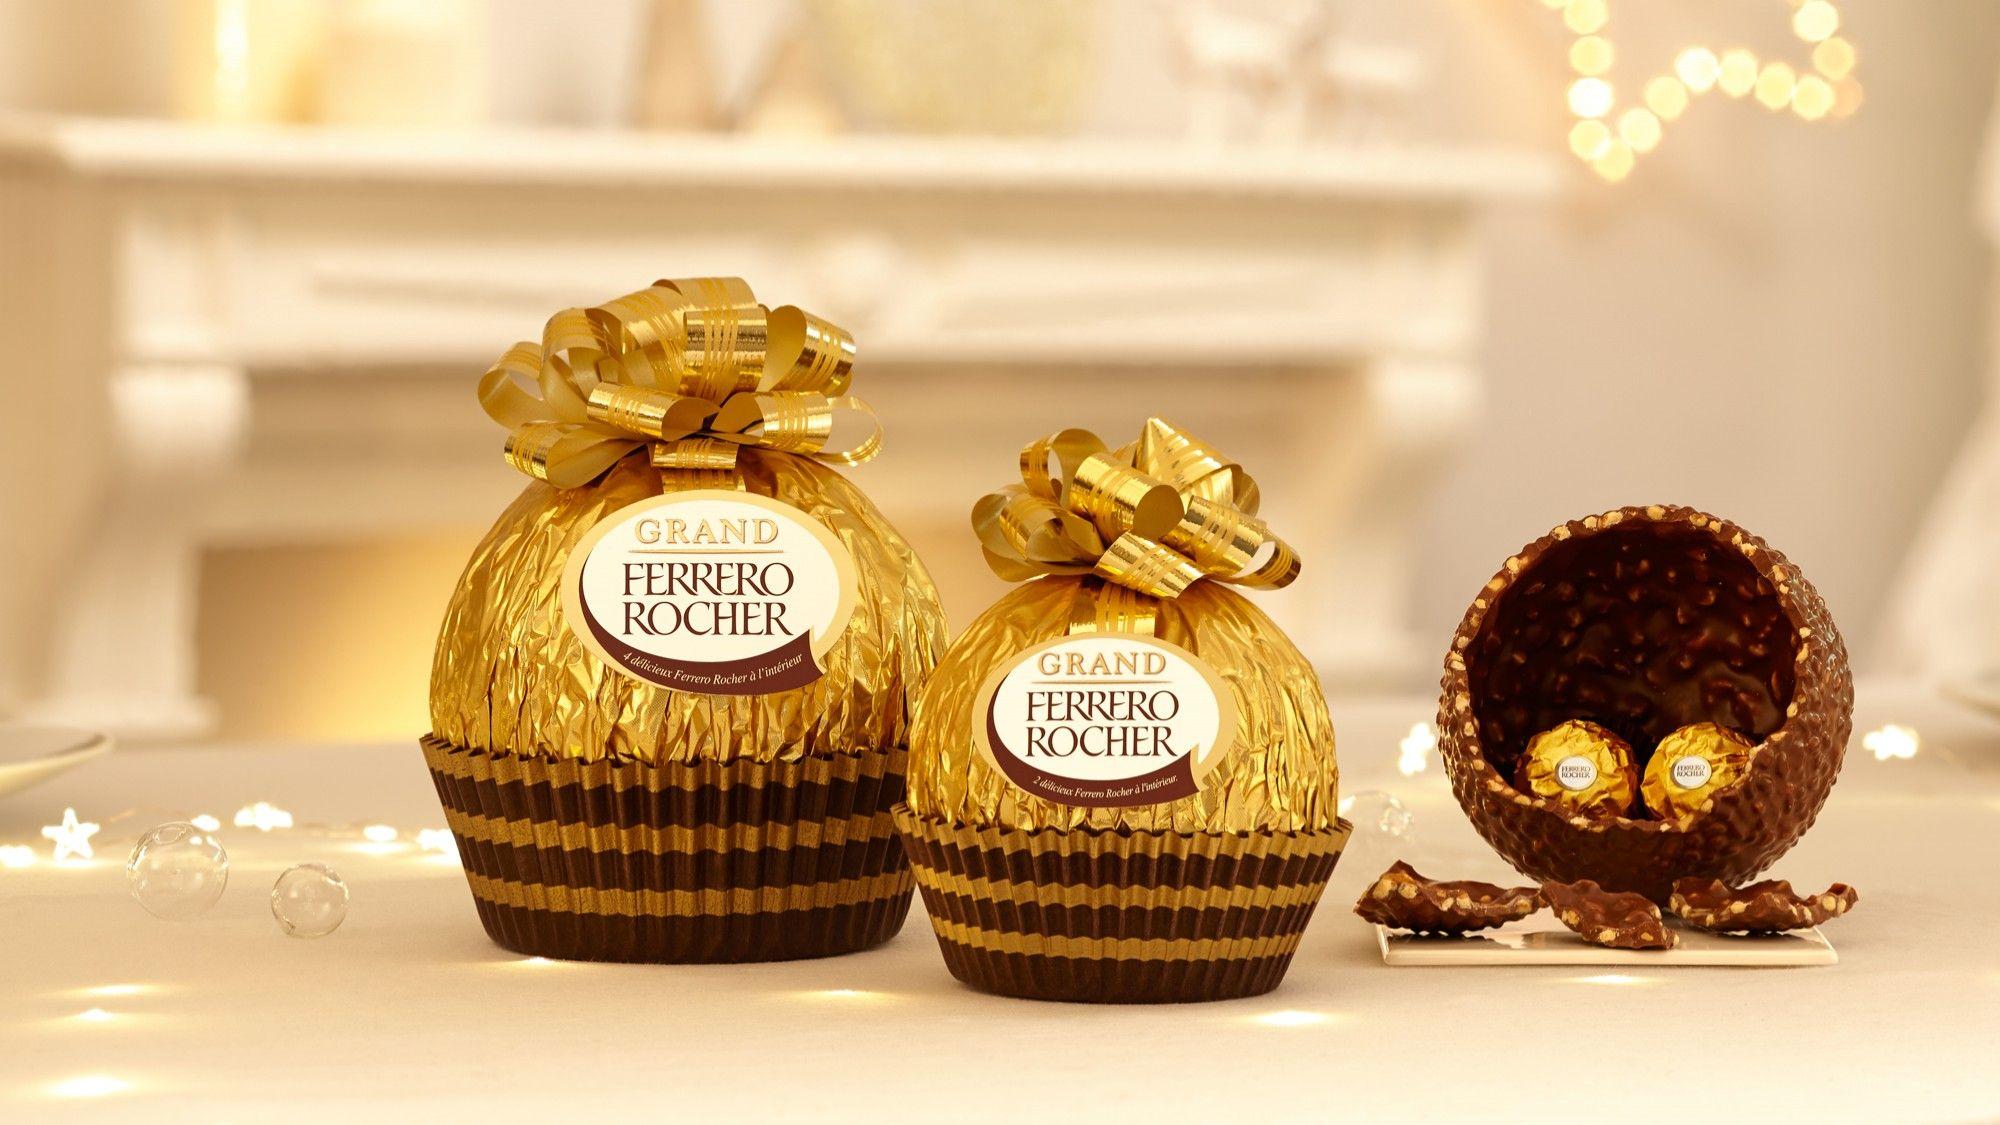 Ferrero, http://ferrerochocolates.com.au/products/grand-ferrero-rocher